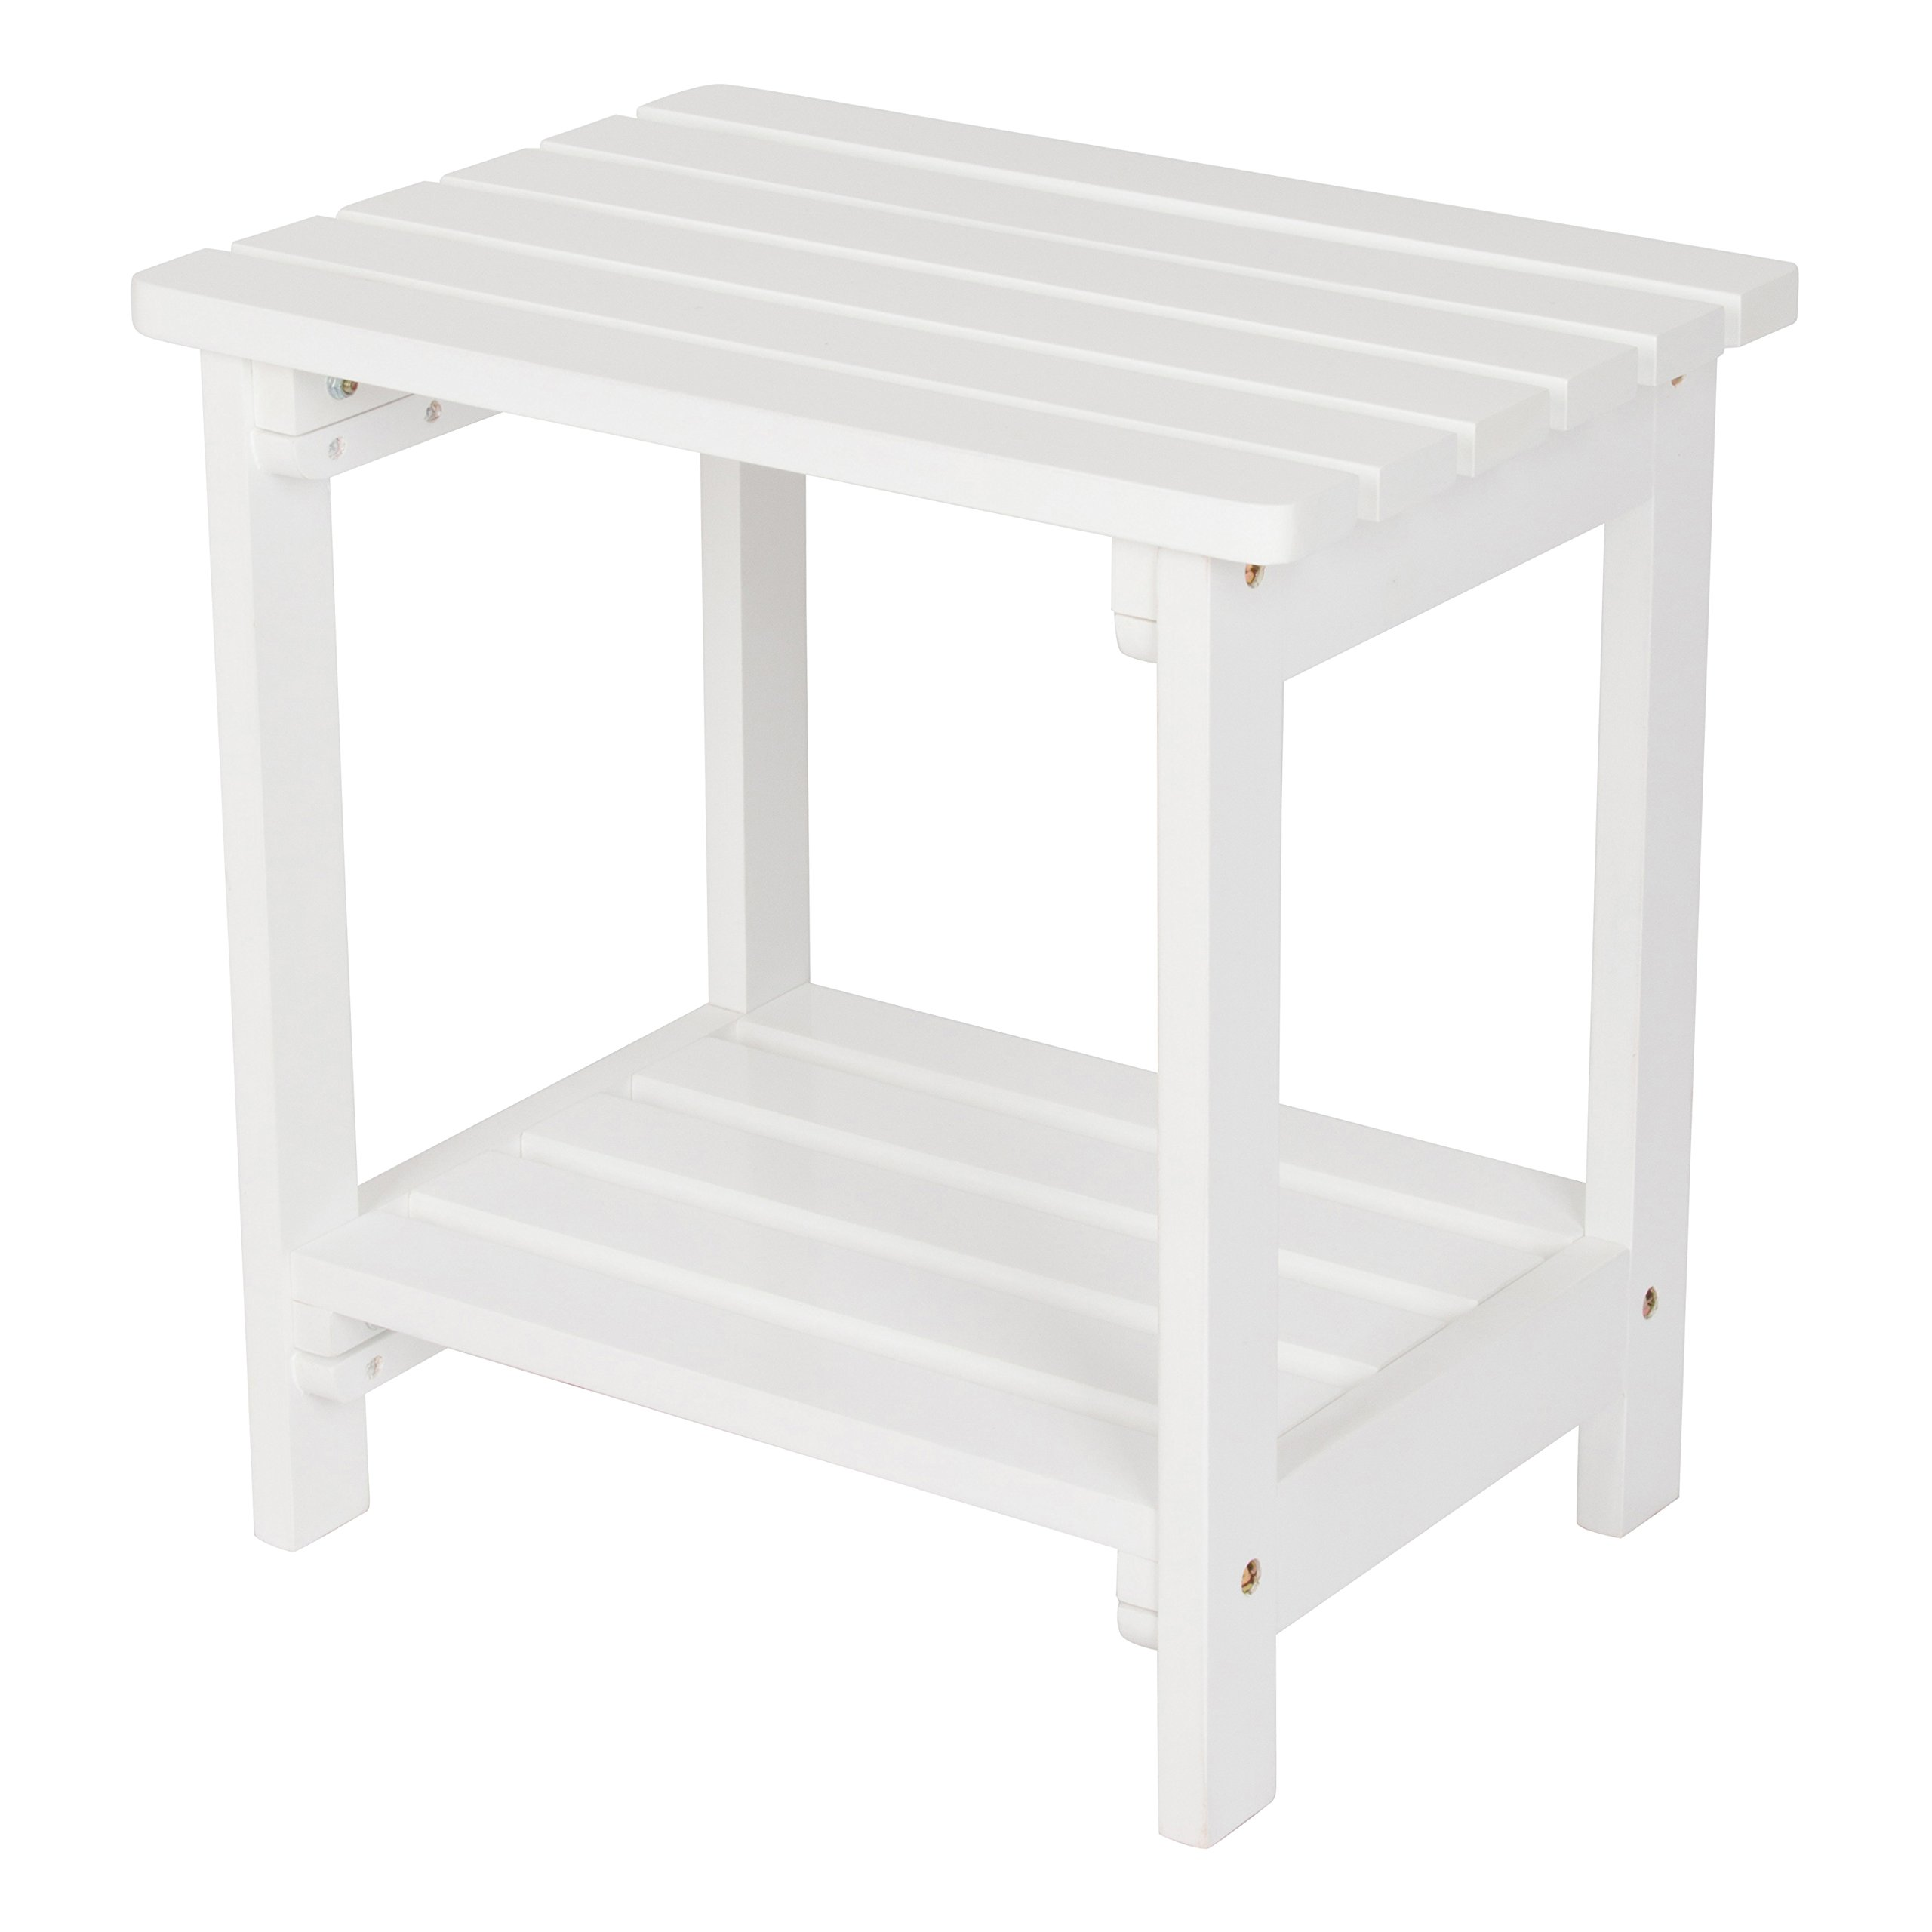 Shine Company Inc. 4104WT Rectangular Side Table, White